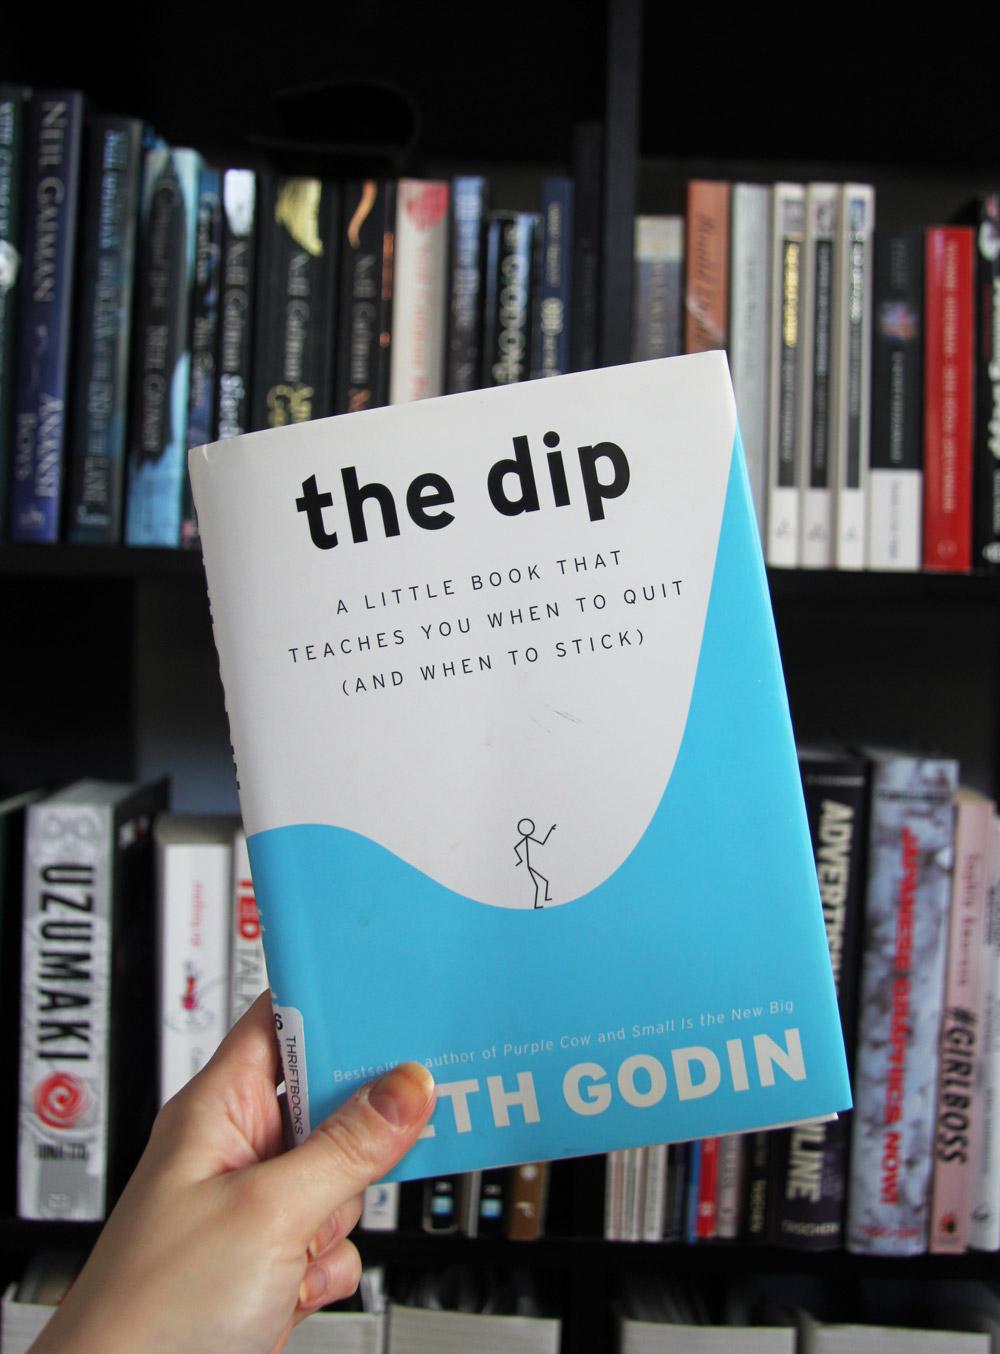 the-dip-seth-godin